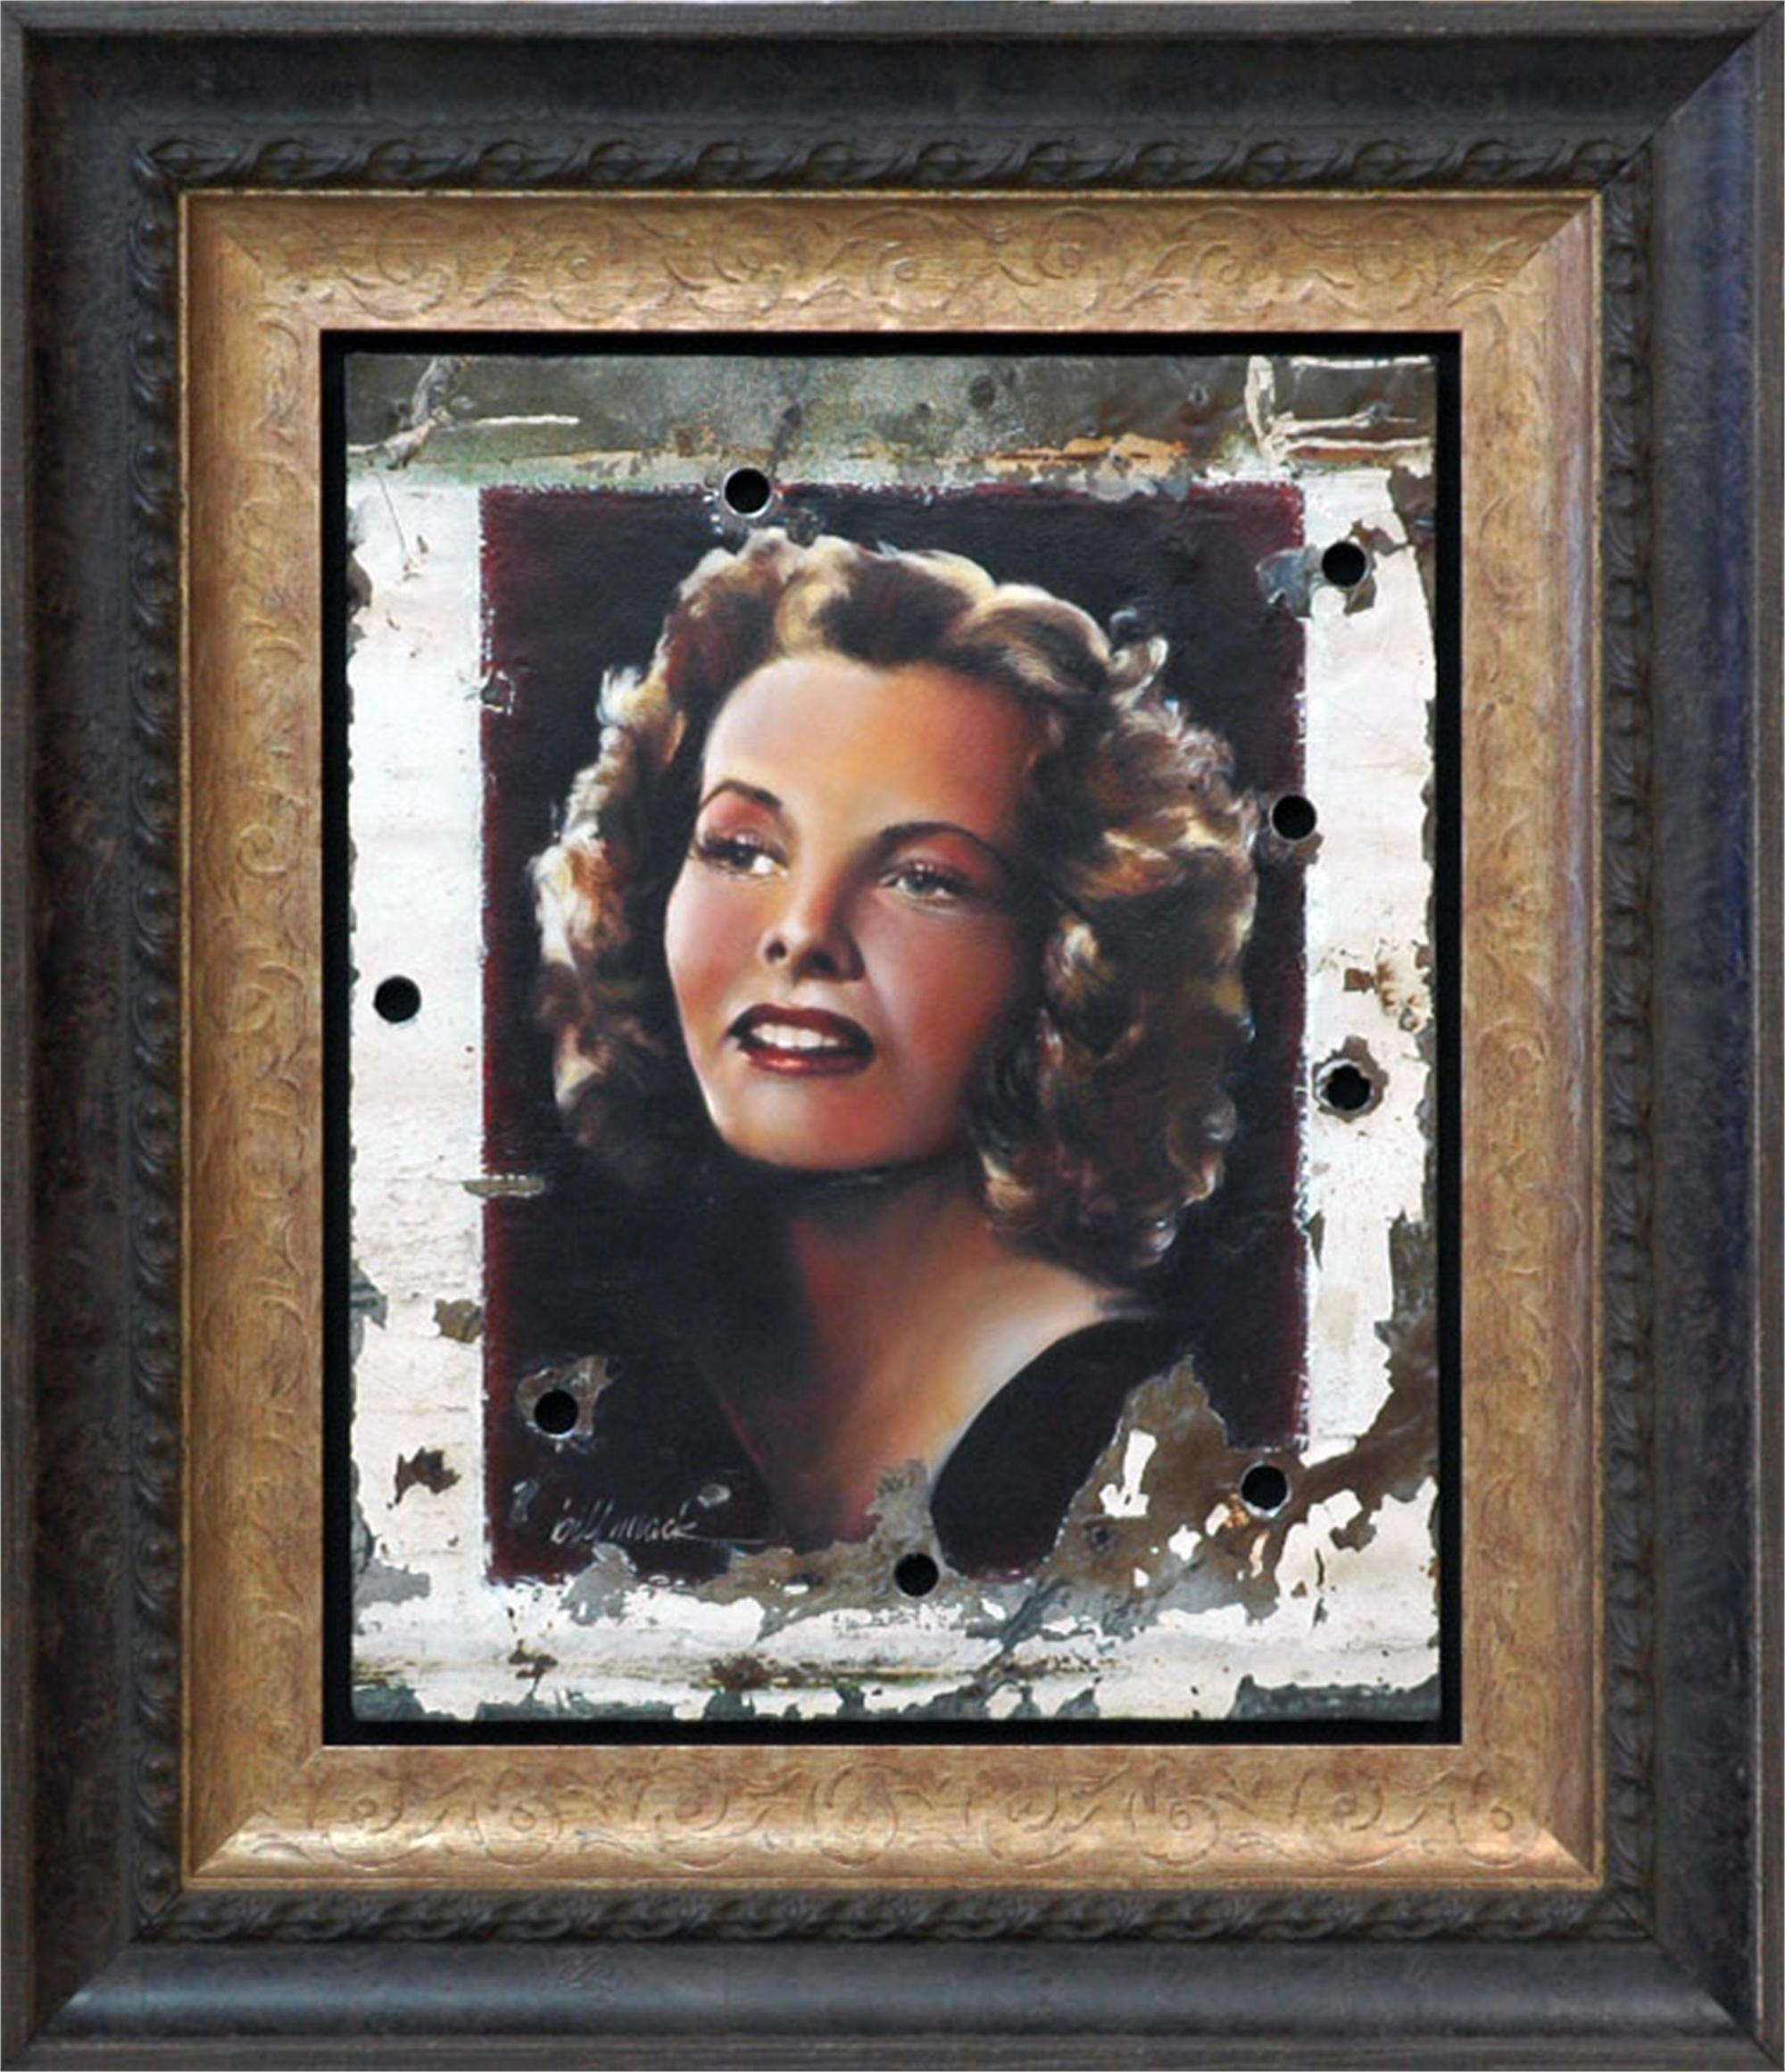 Angelic- Kathryn Hepburn by Bill Mack